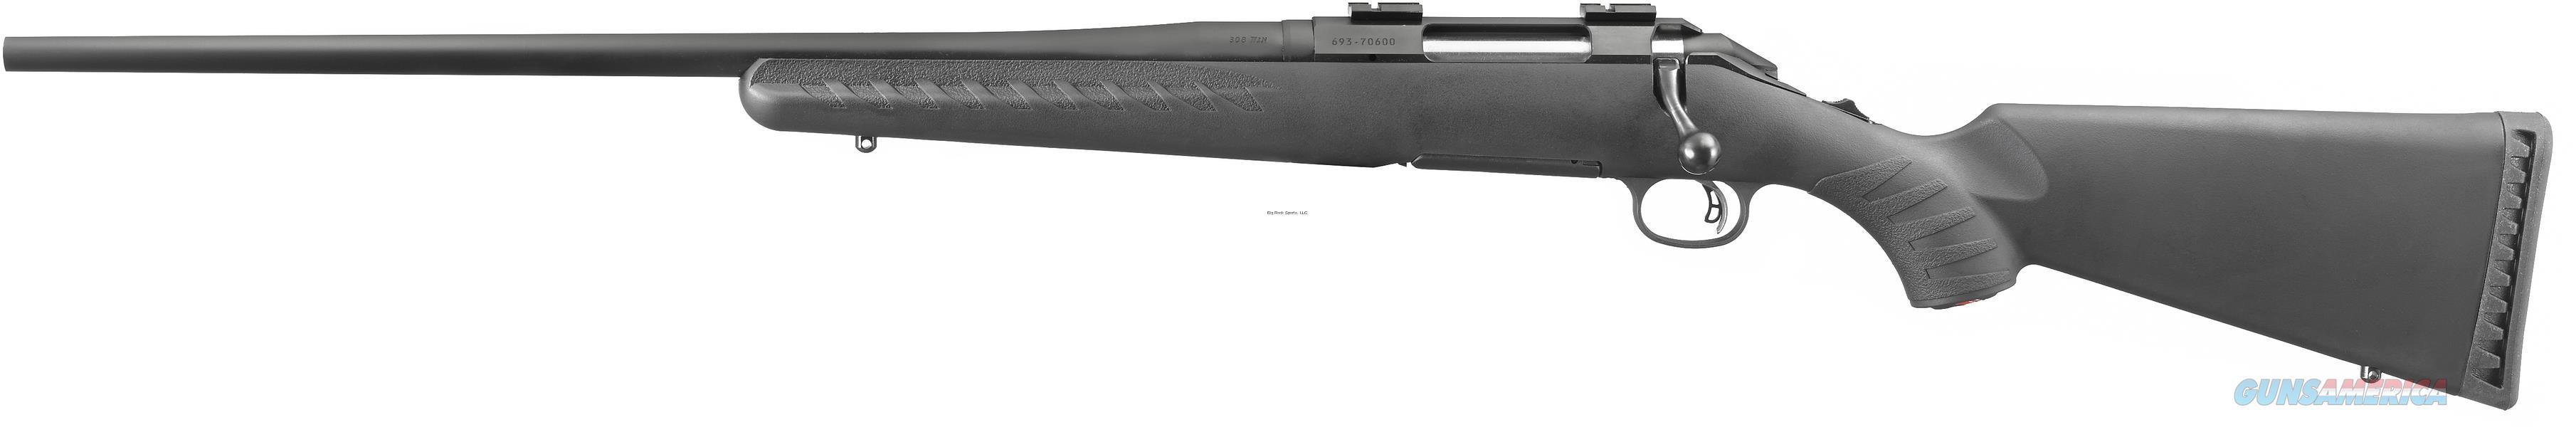 "American 308Win Bl/Sy 22"" Lh # 6917  Guns > Rifles > R Misc Rifles"